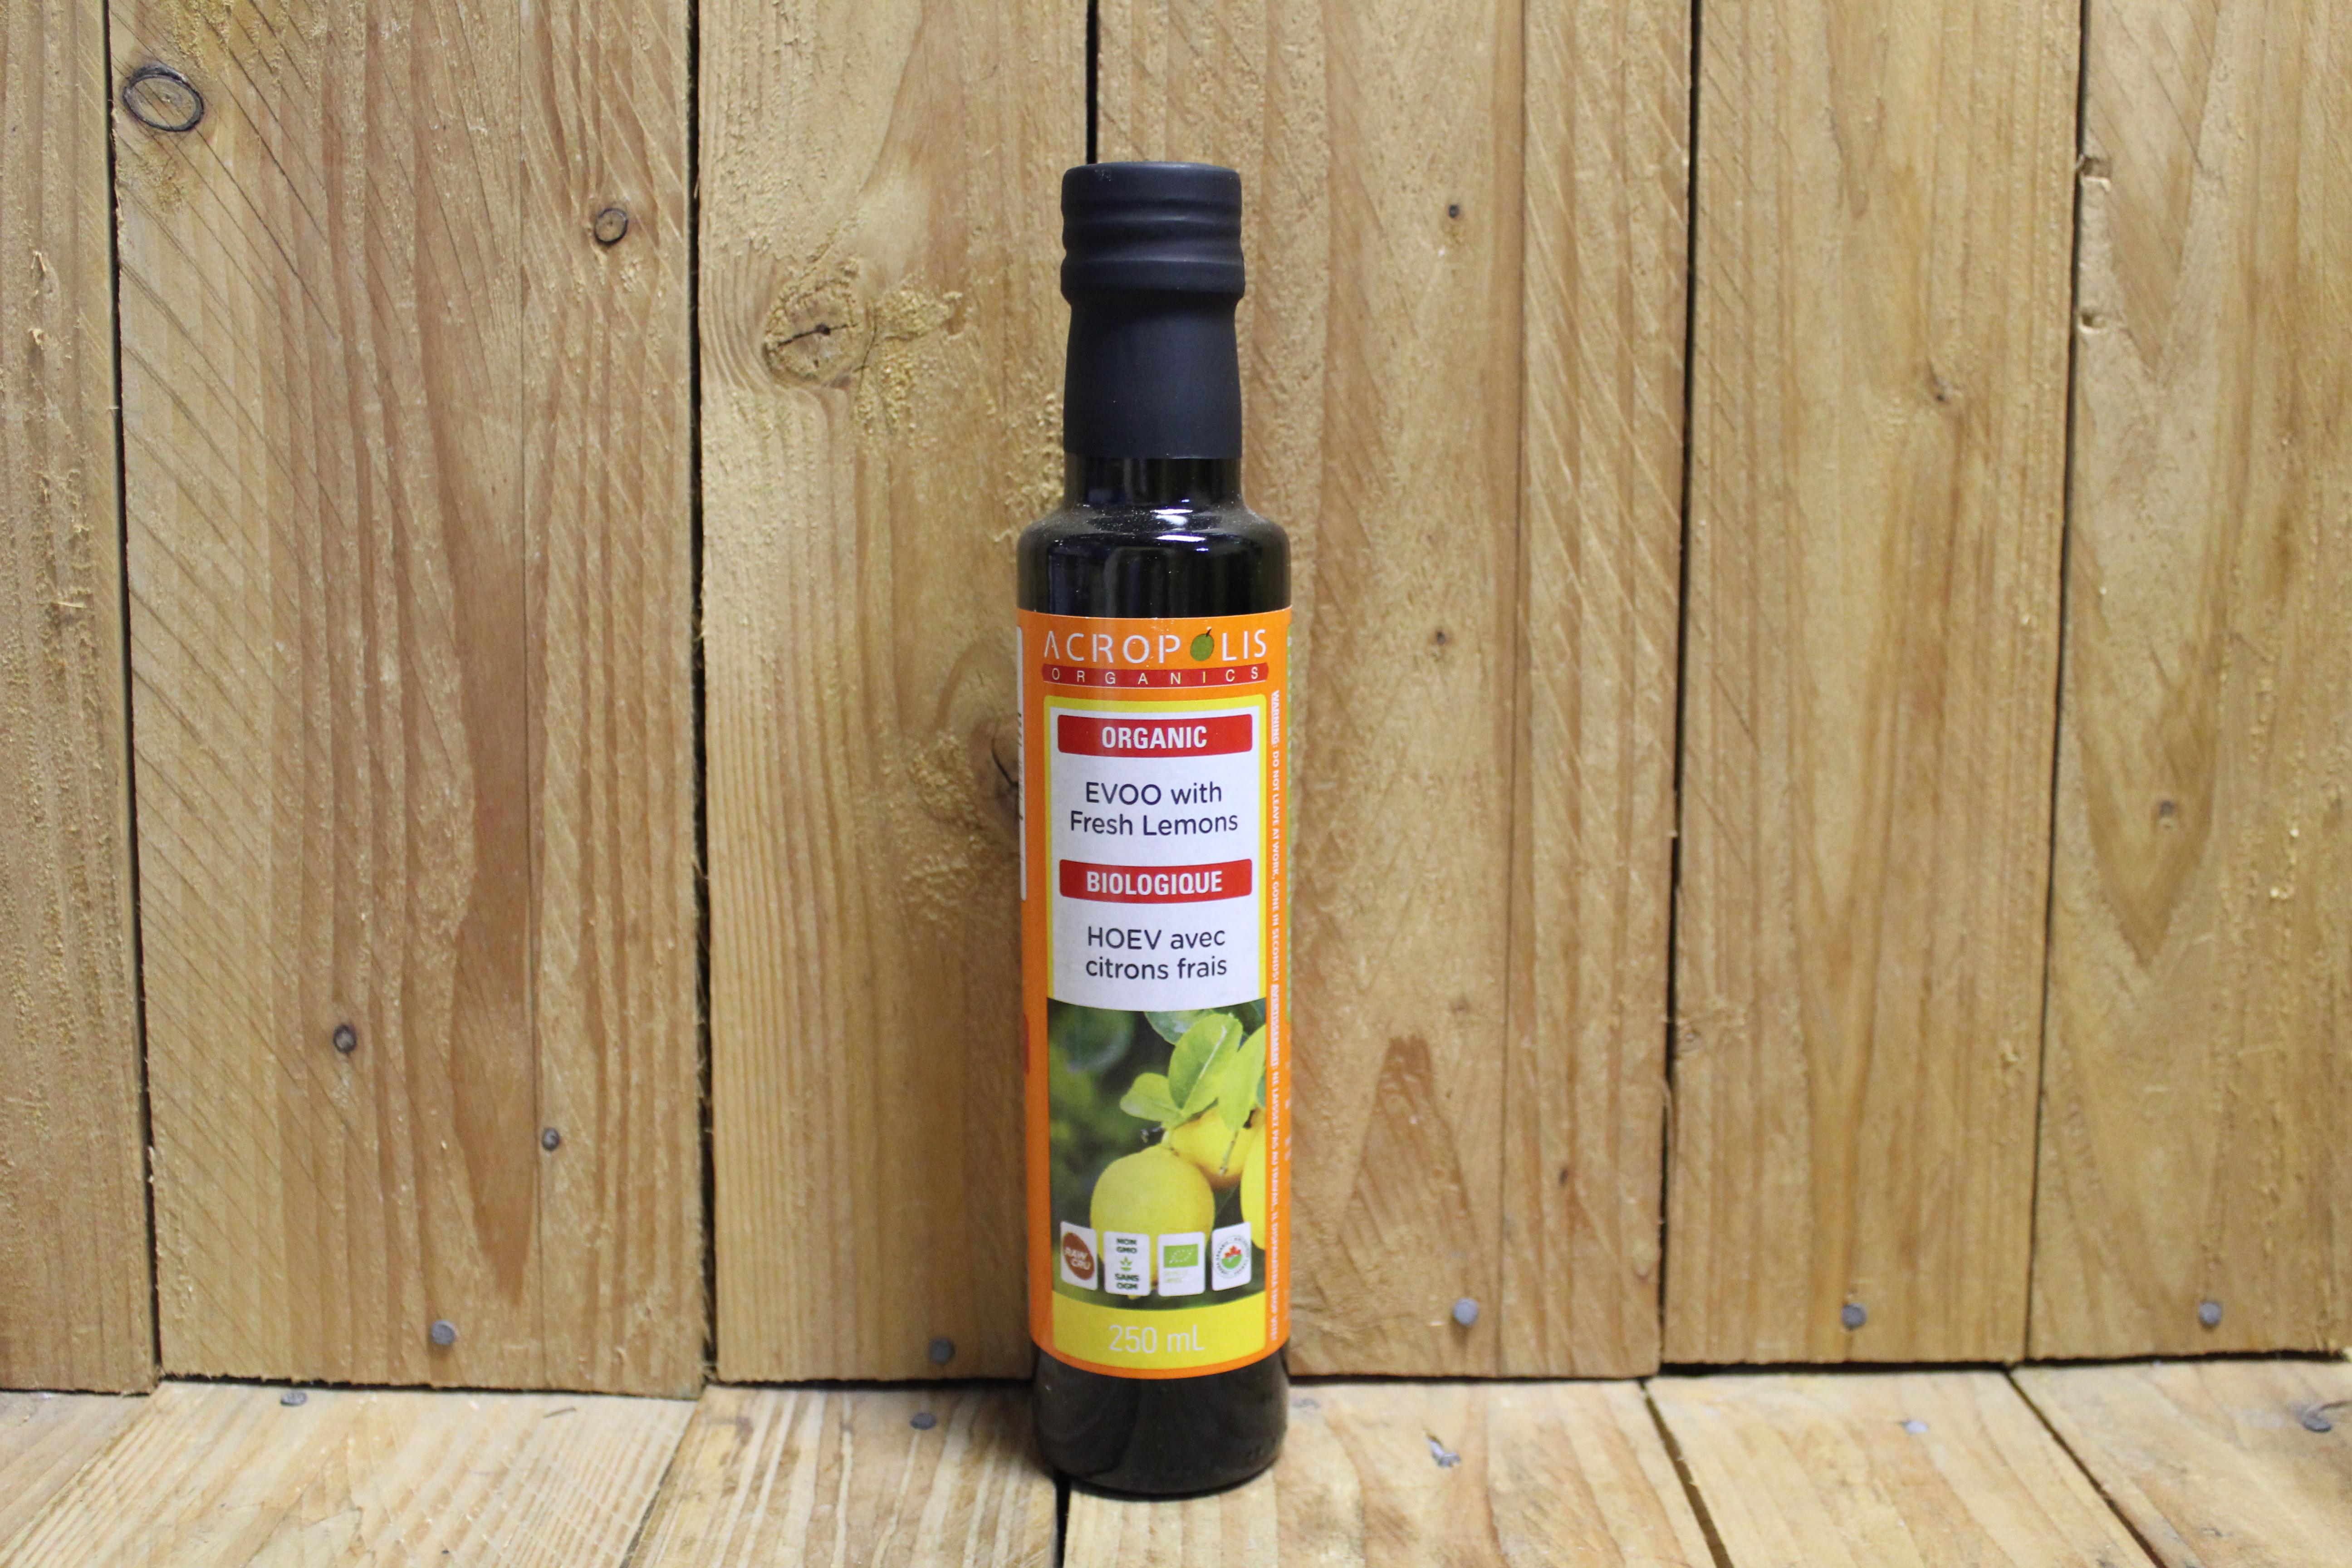 Acropolis – Organic EVOO with Fresh Lemons (250ml)